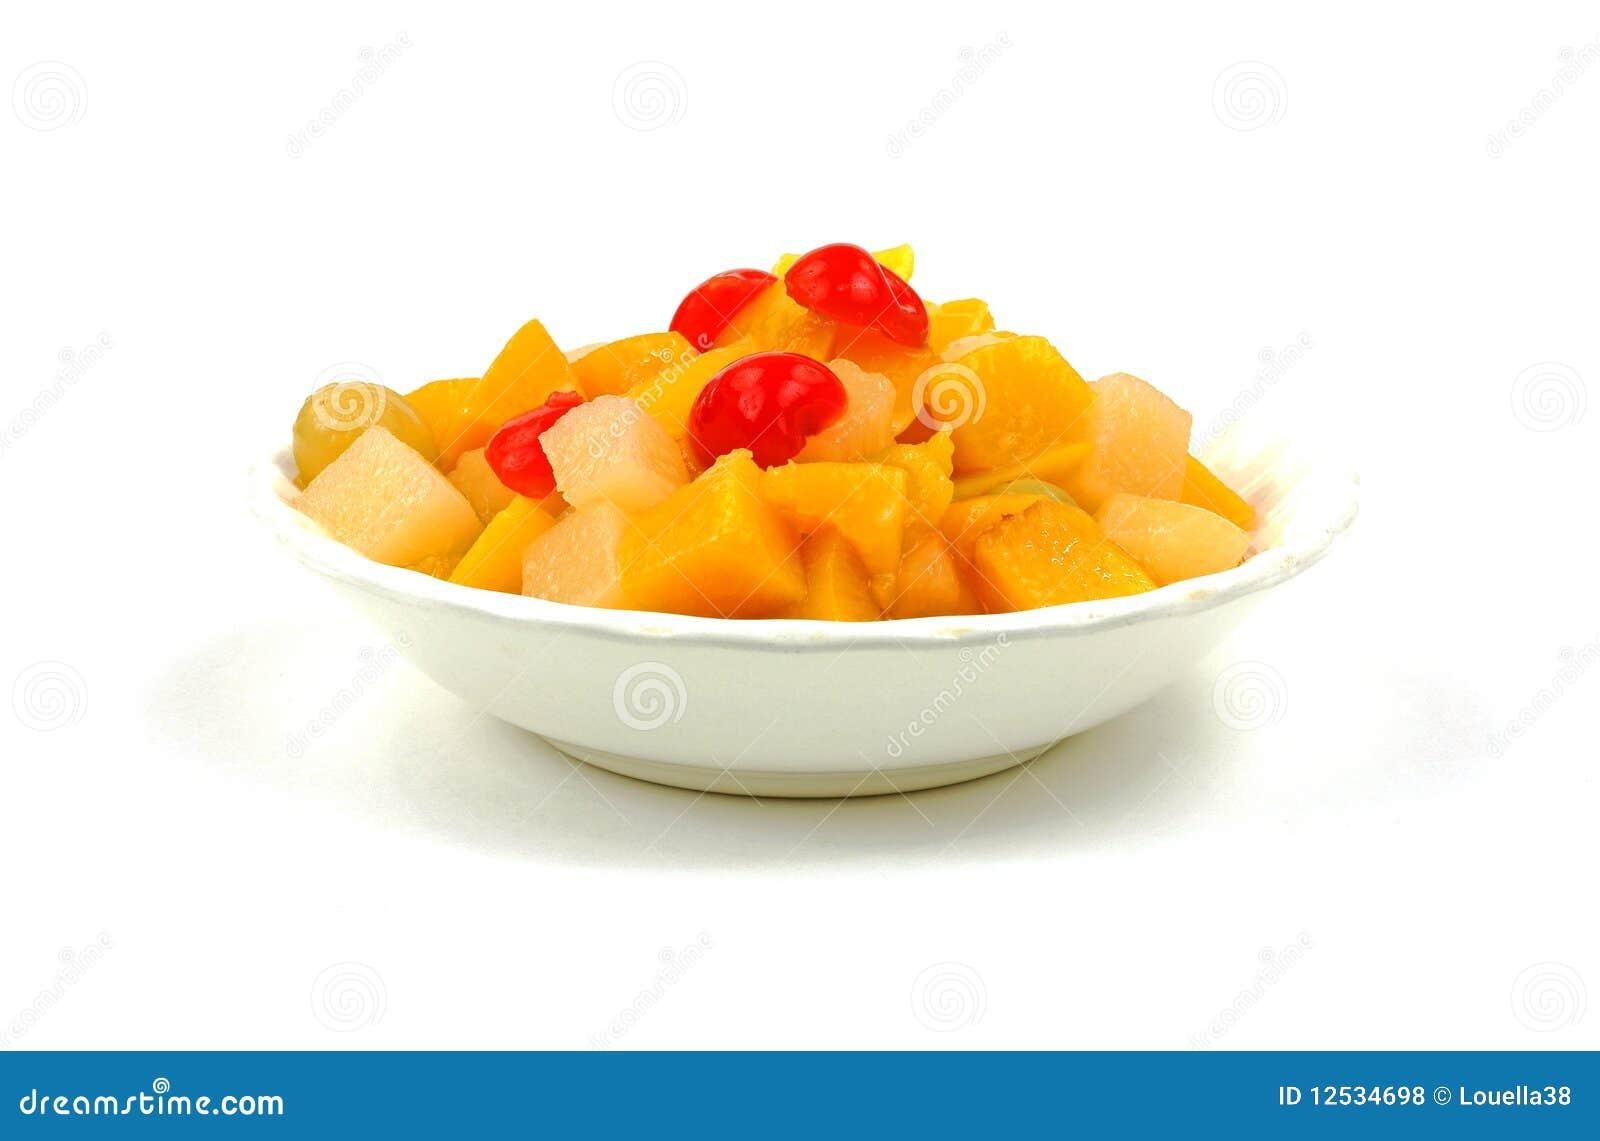 Ingeblikte fruitcocktail